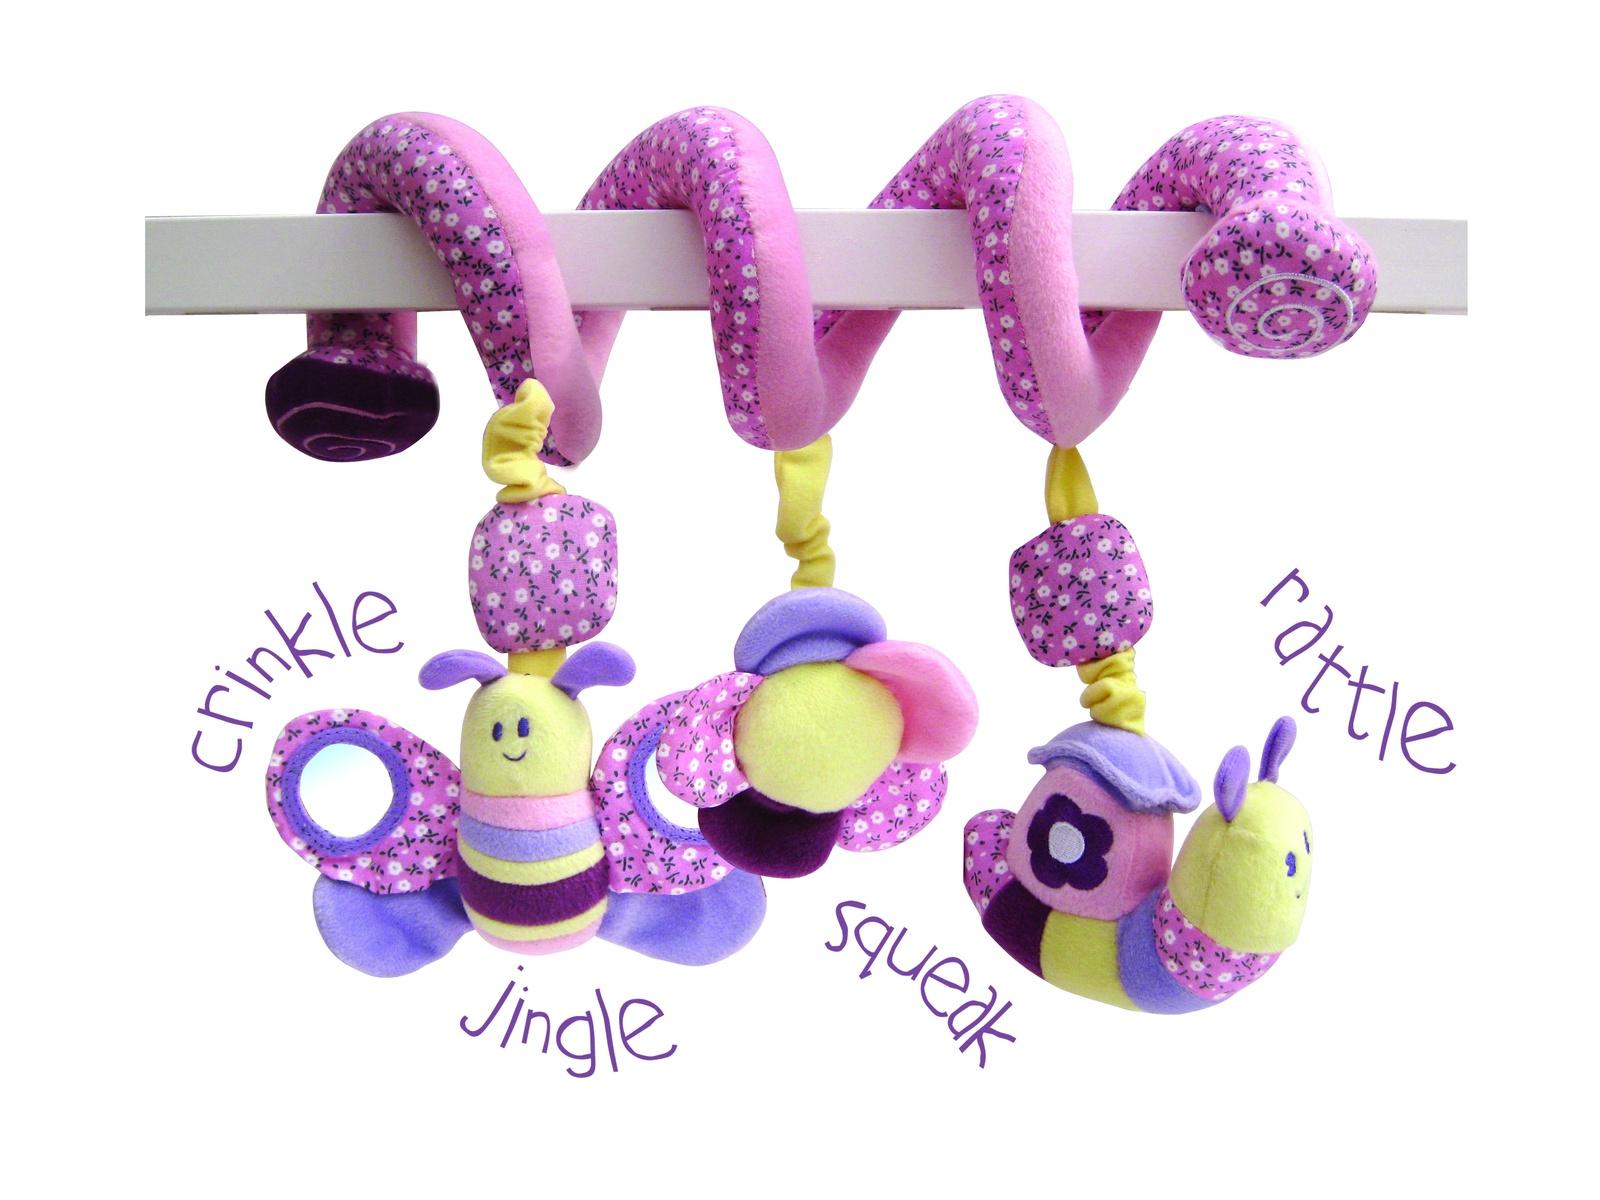 Игрушка-подвеска Little Bird Told Me Развивающая игрушка розовый little bird told me развивающий коврик щенок